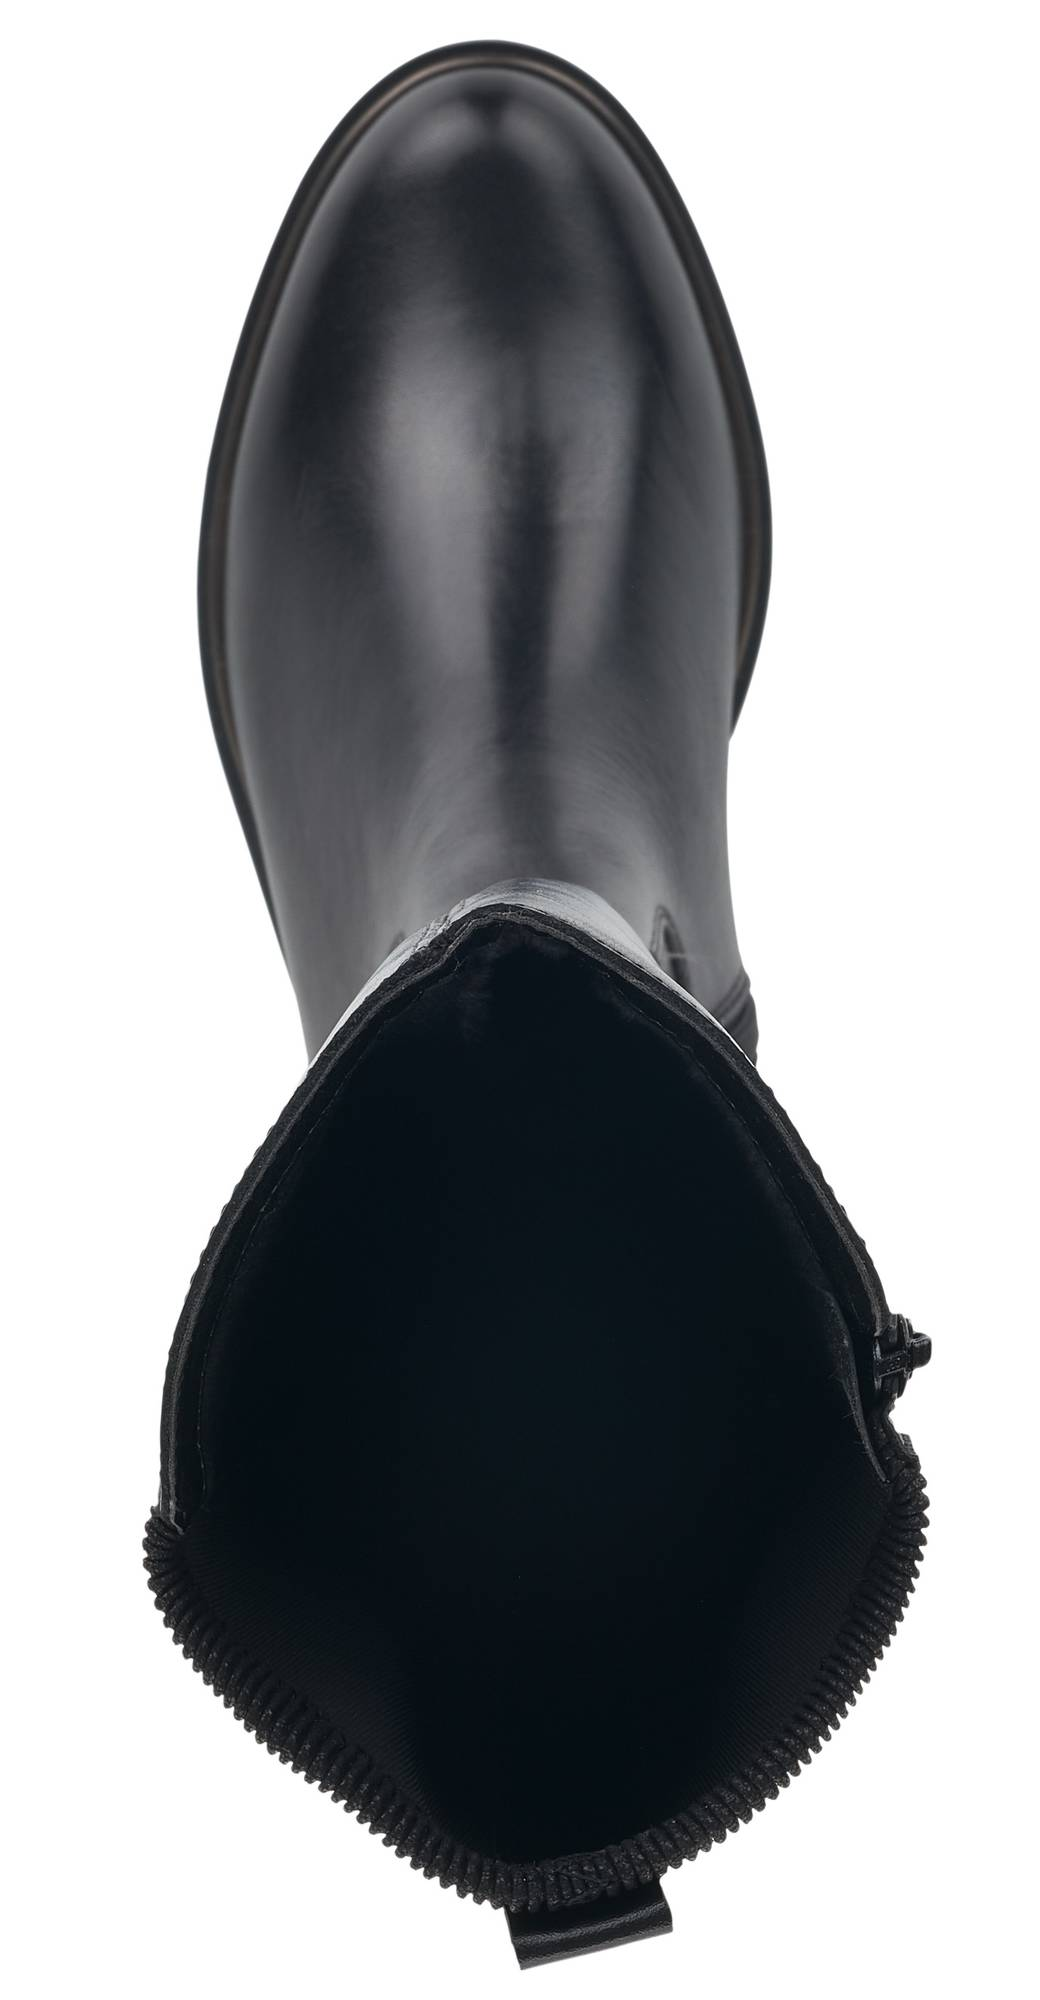 Rieker Remonte Stövlar D8371 01 svart Stilettoshop.se webbutik